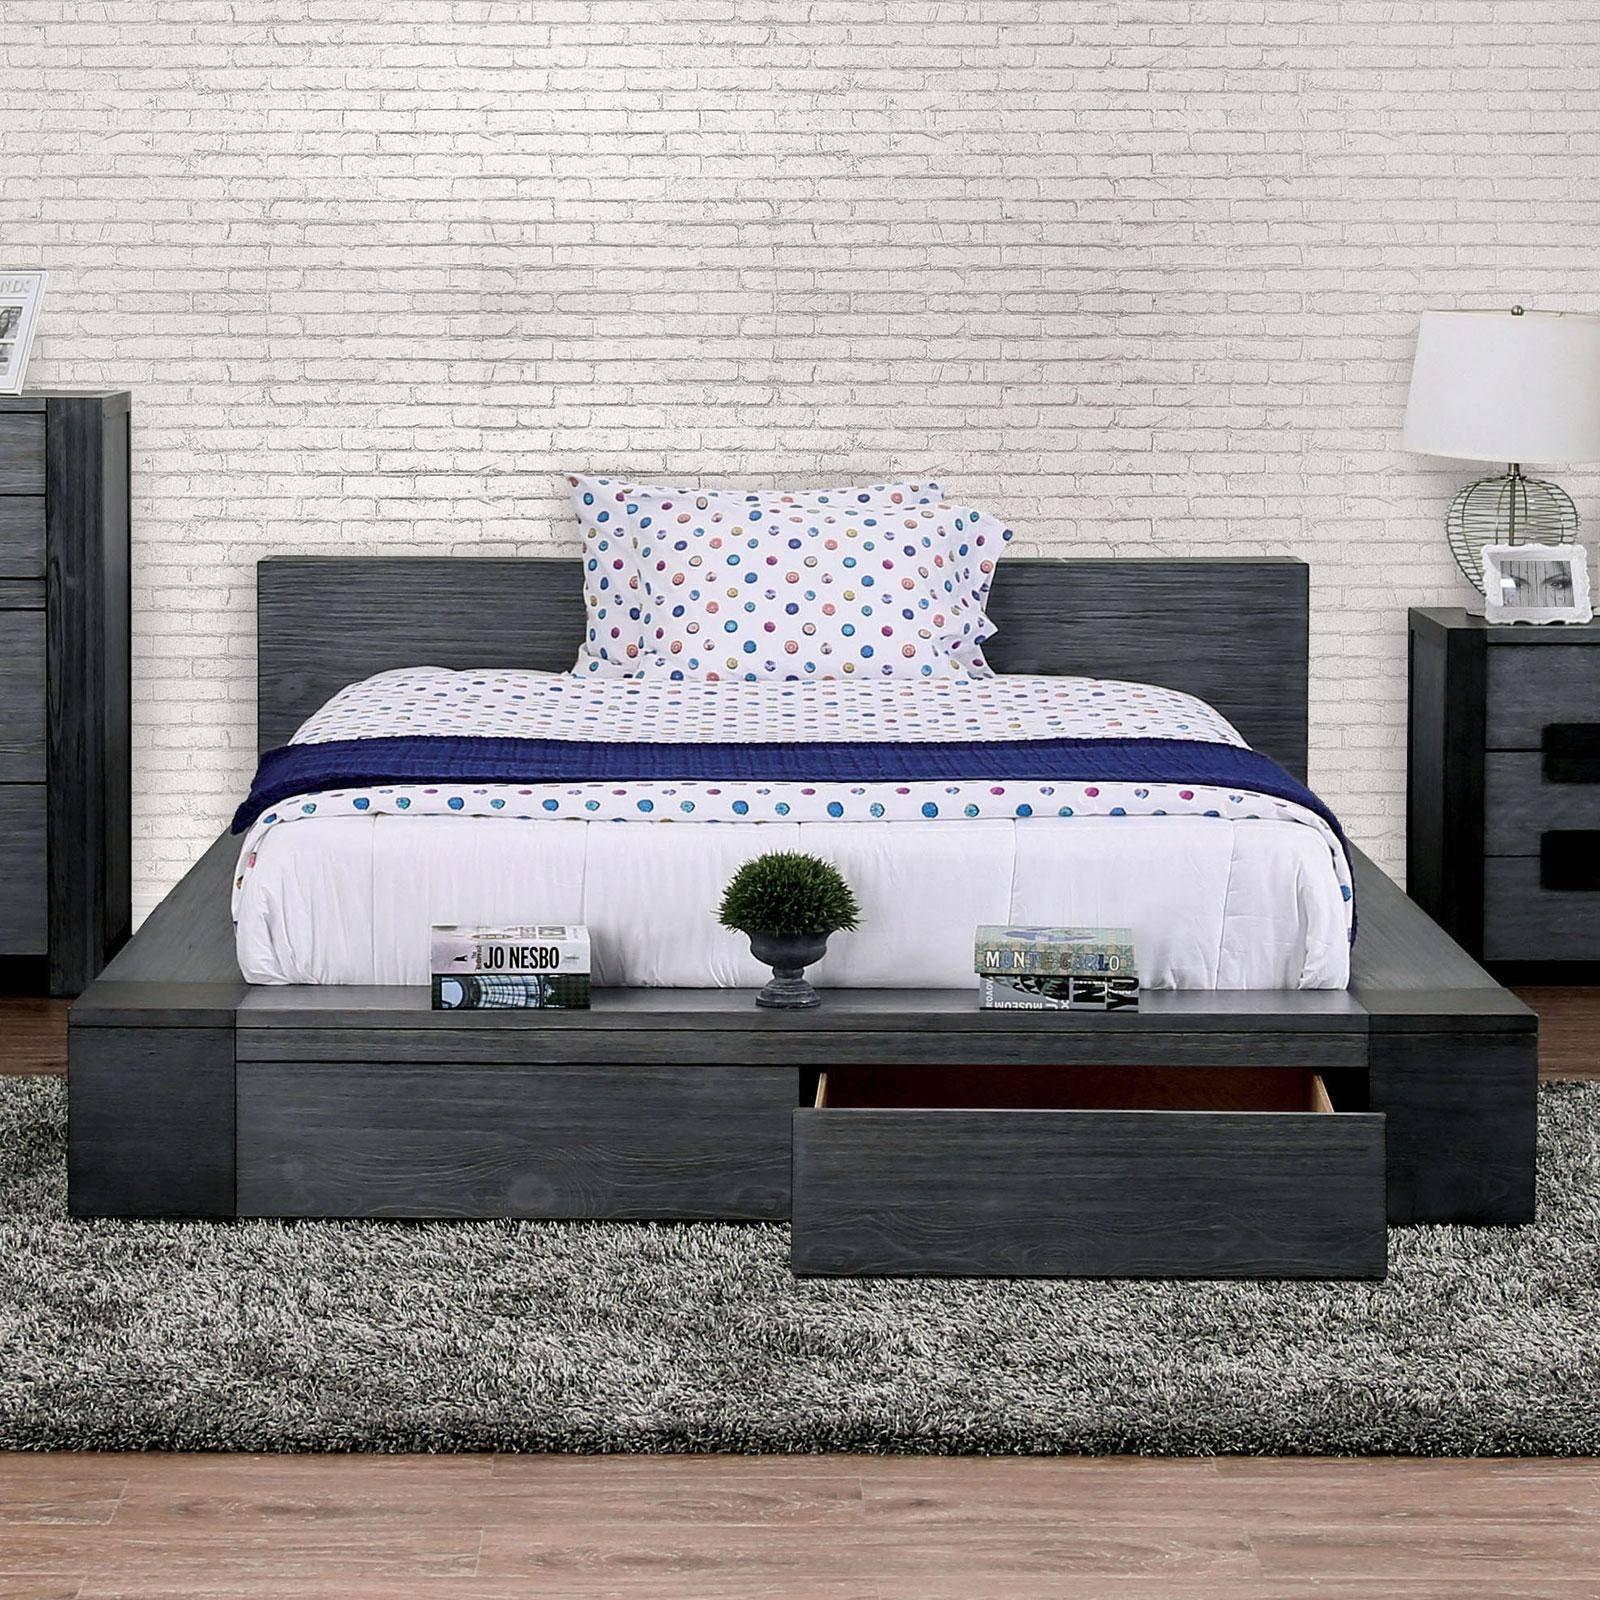 Rooms to Go White Bedroom Set Luxury Rustic Gray Finish Queen Storage Bedroom Set 5pcs Janeiro